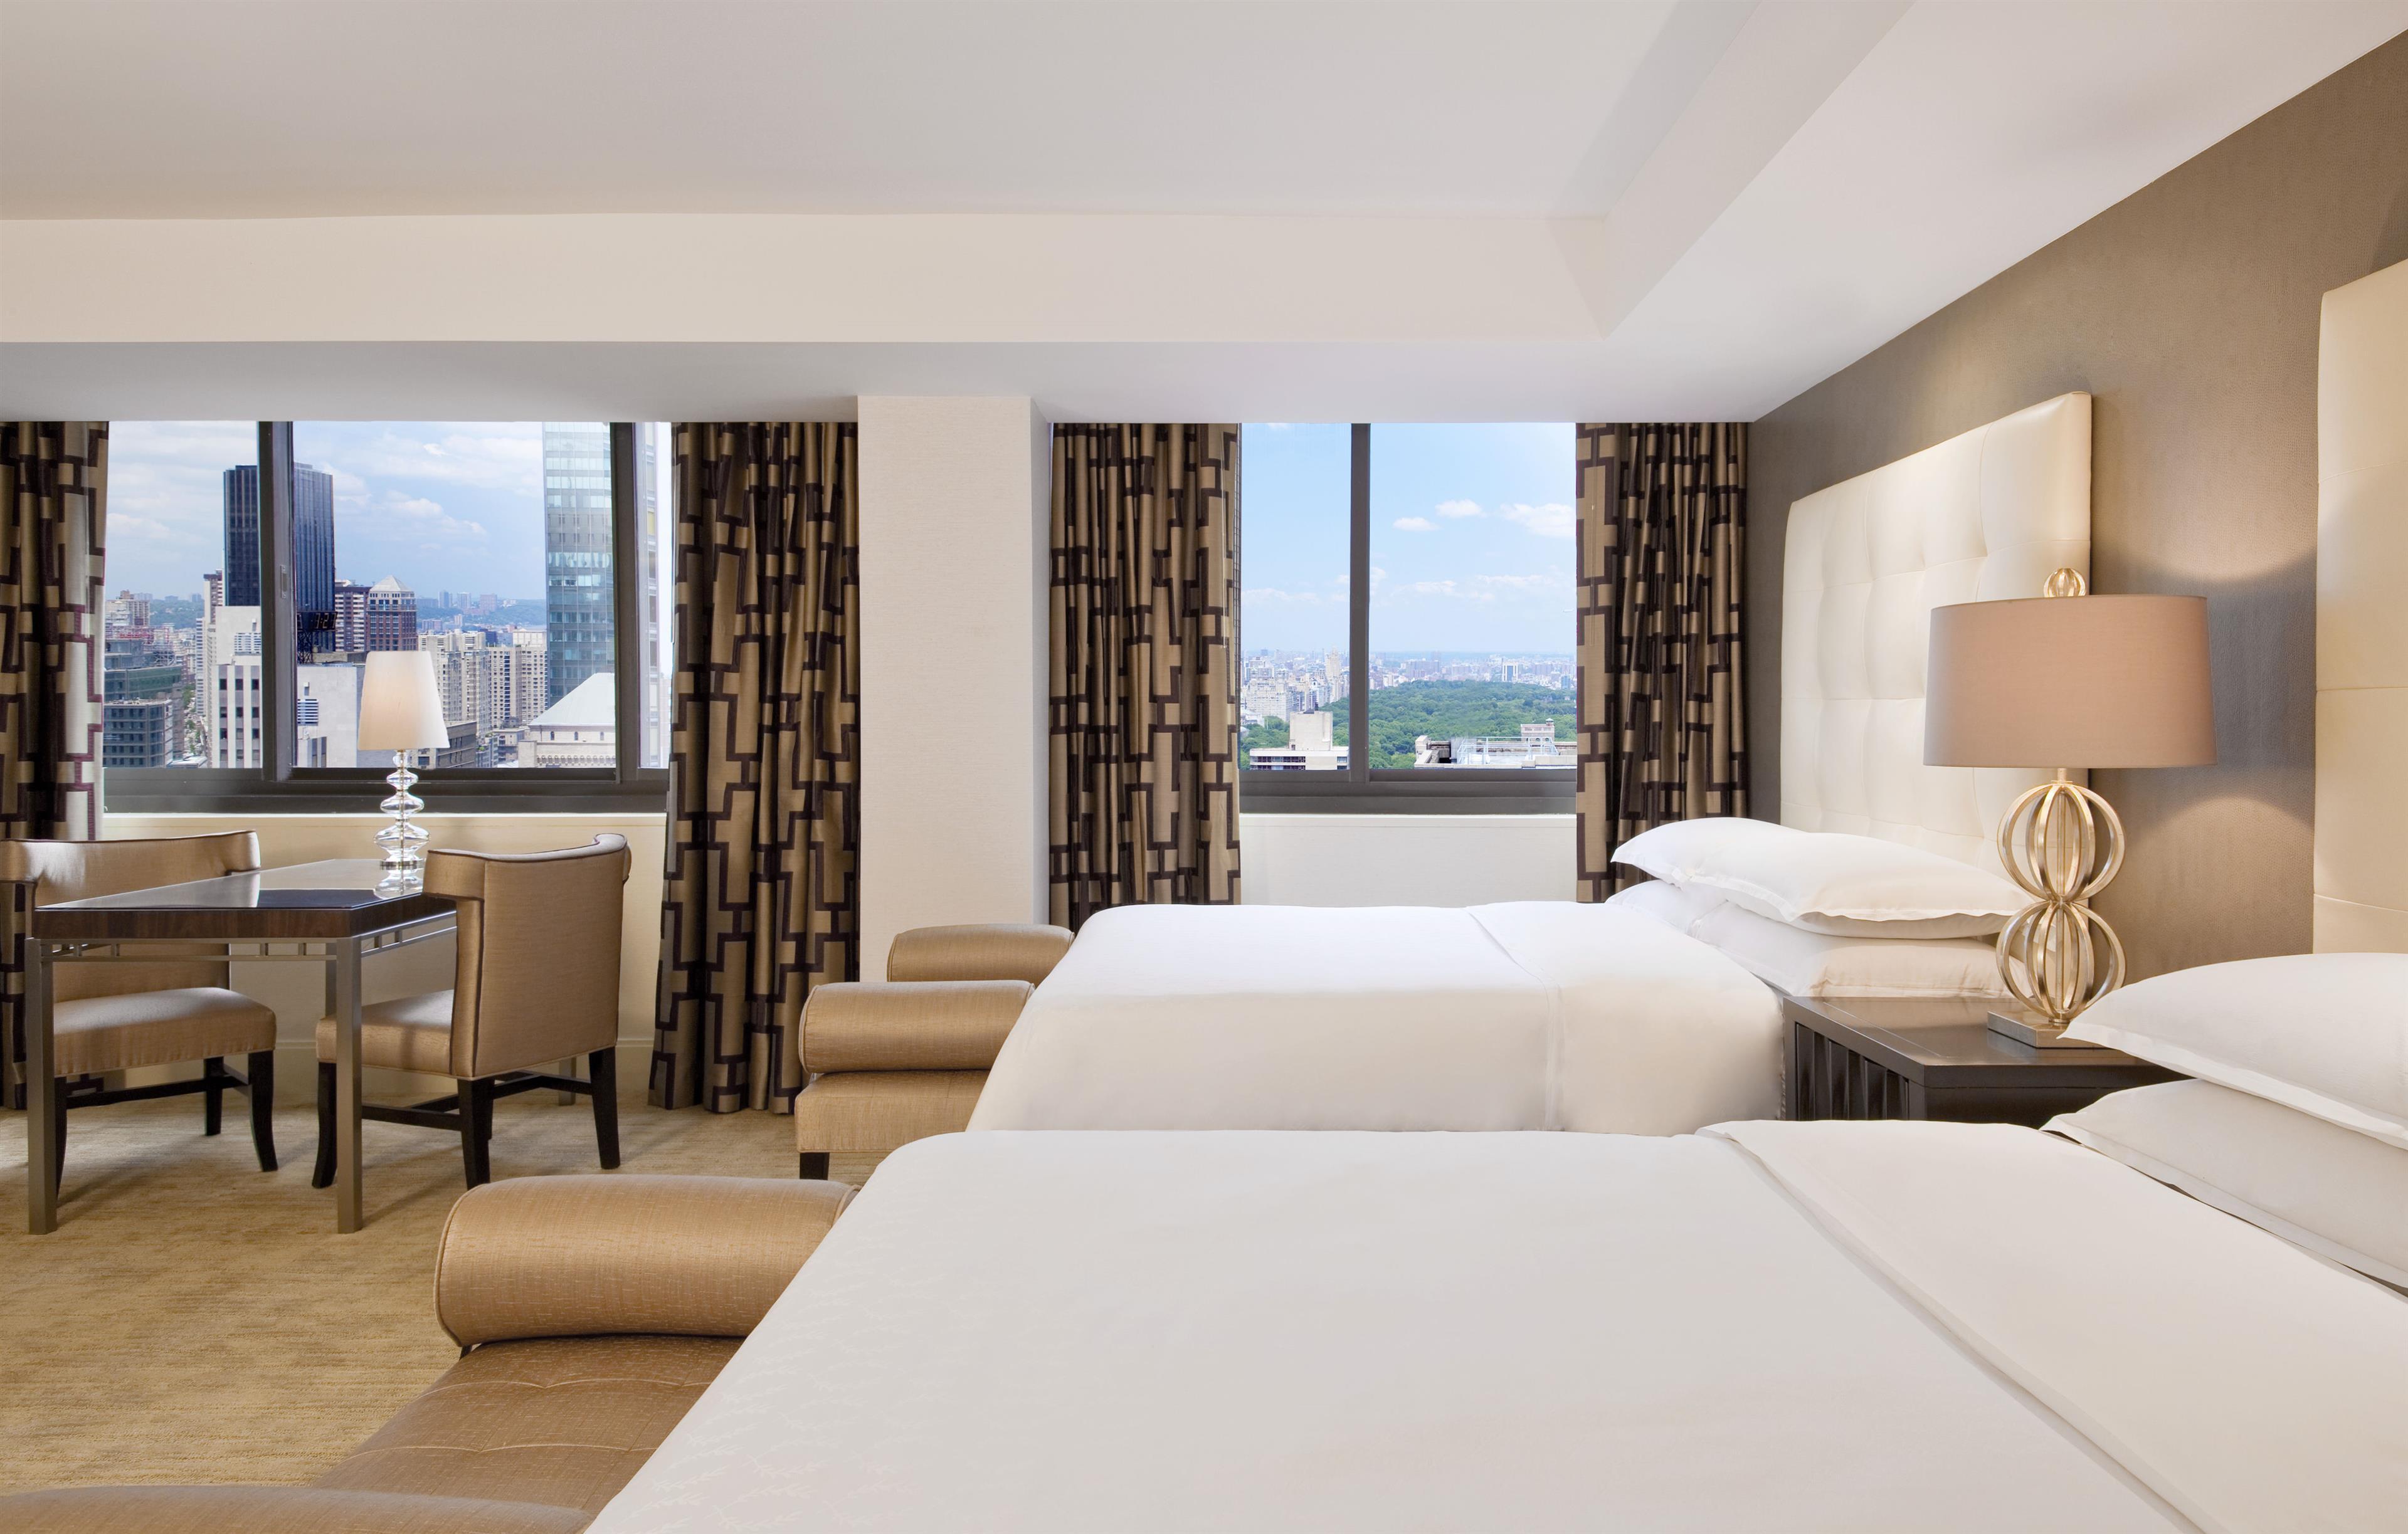 Sheraton New York Times Square Hotel image 13